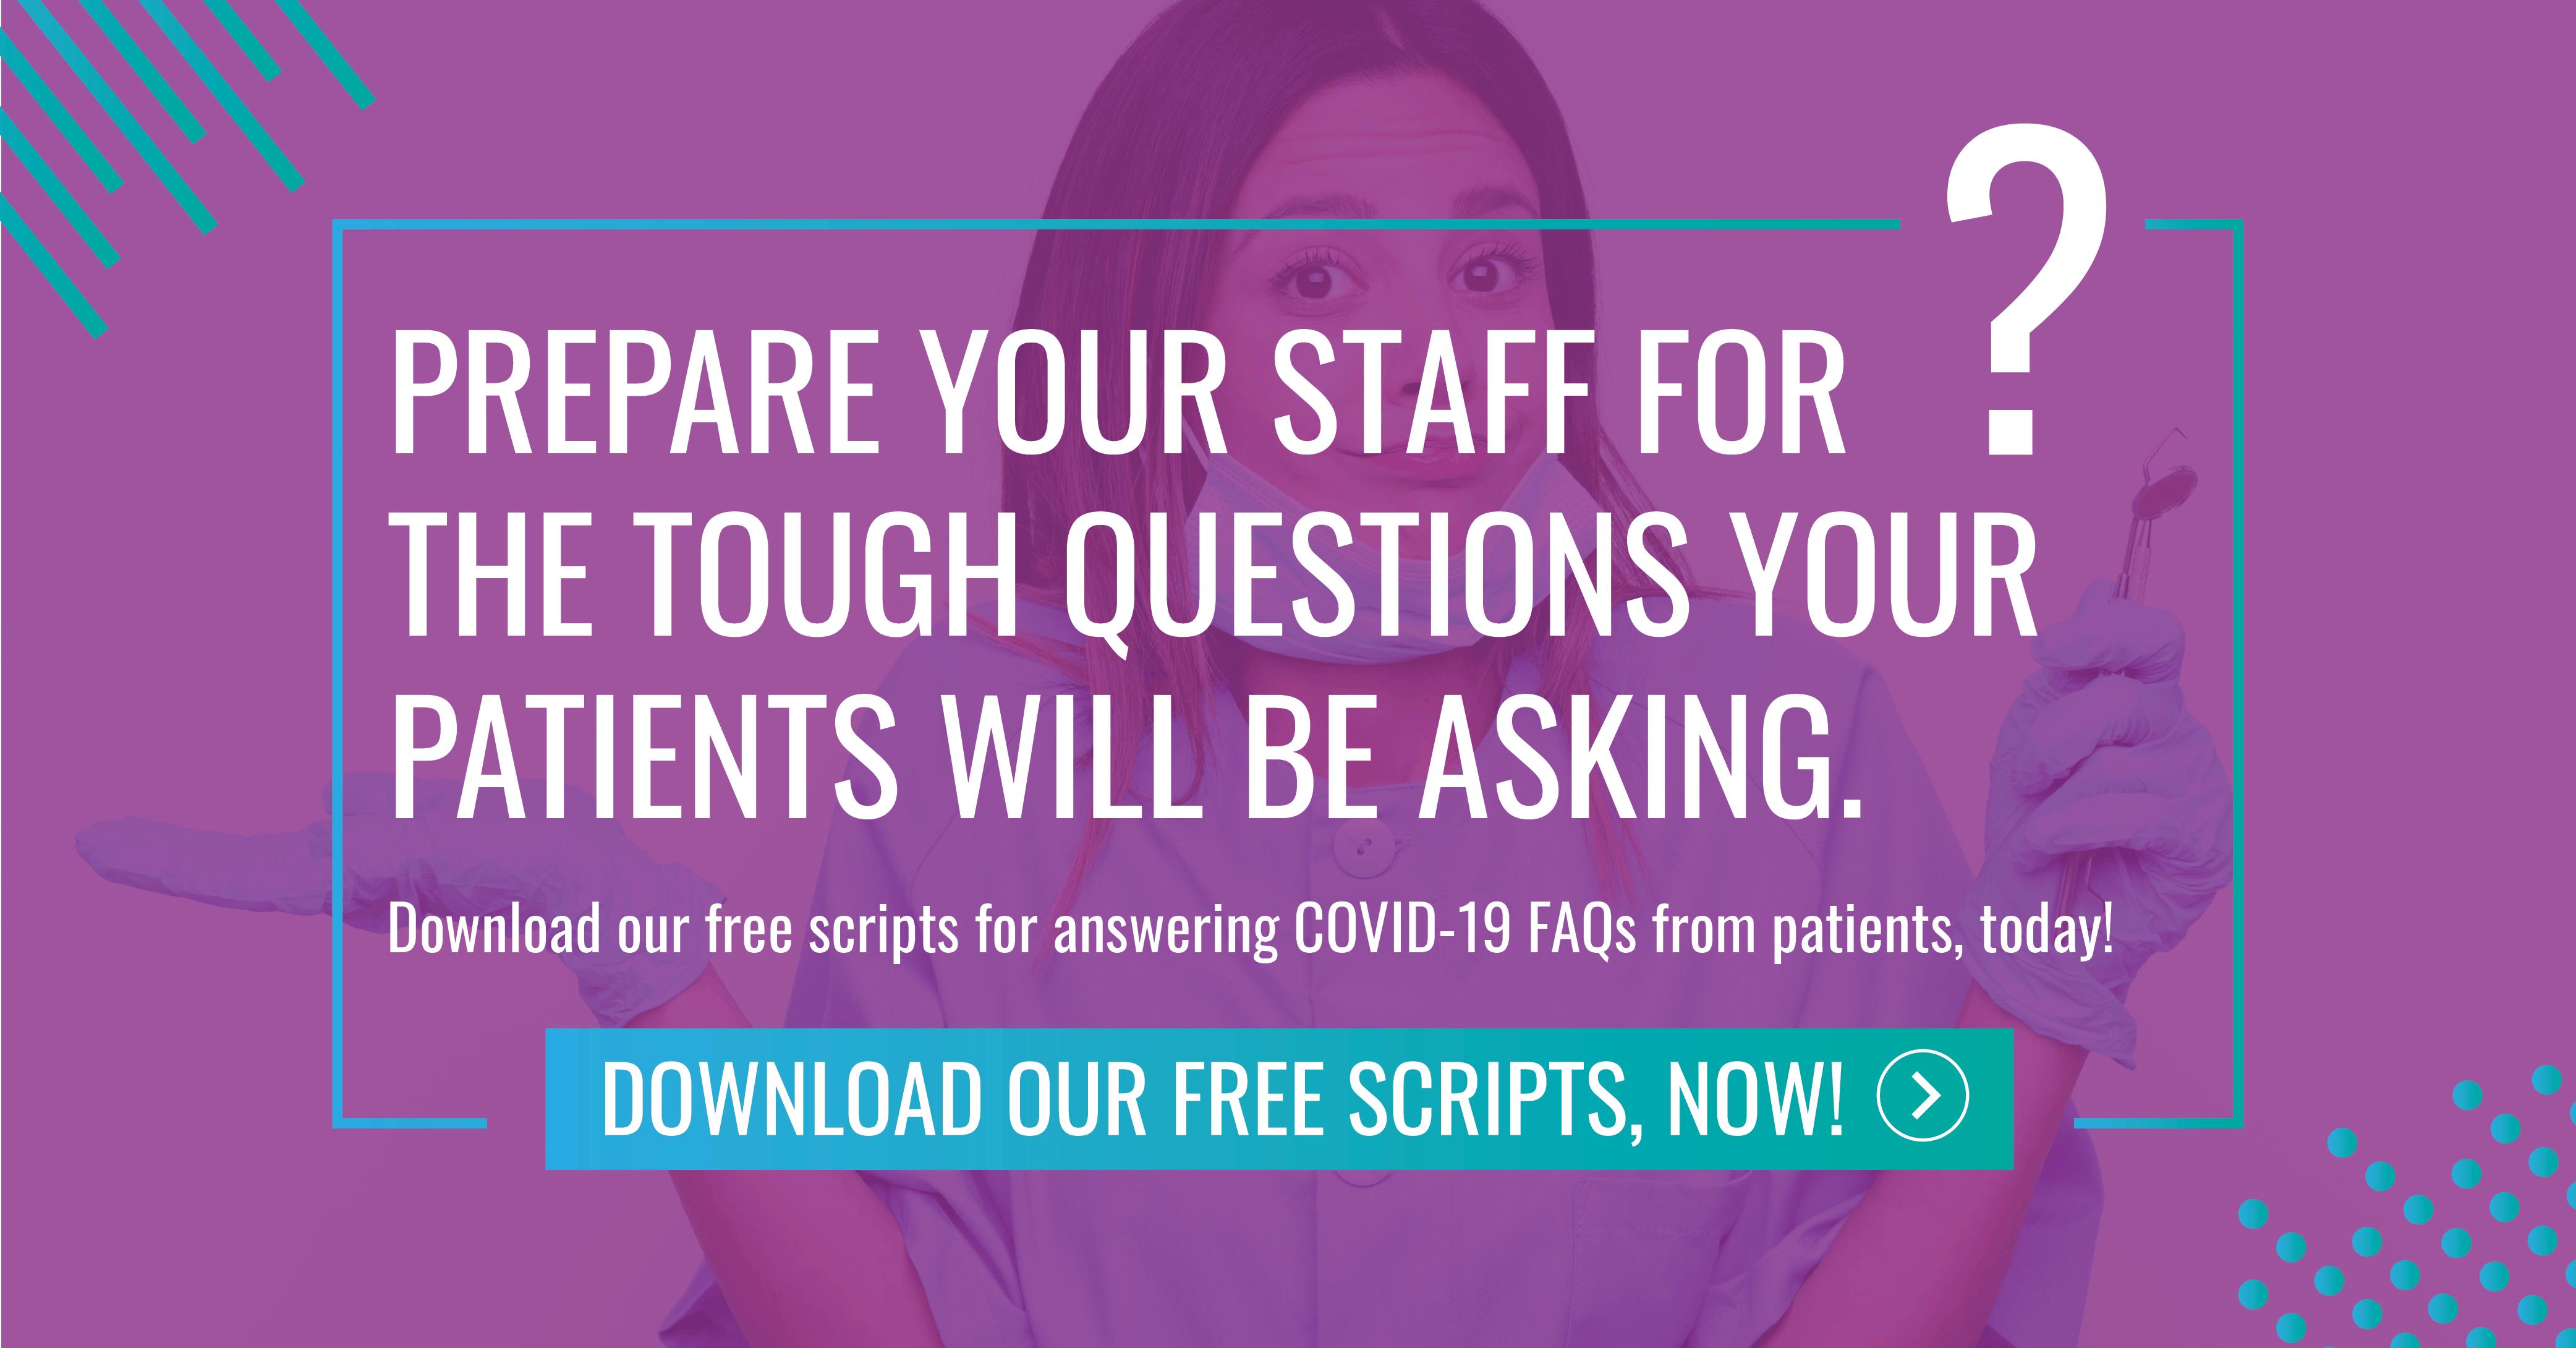 COVID-19 Patient FAQs